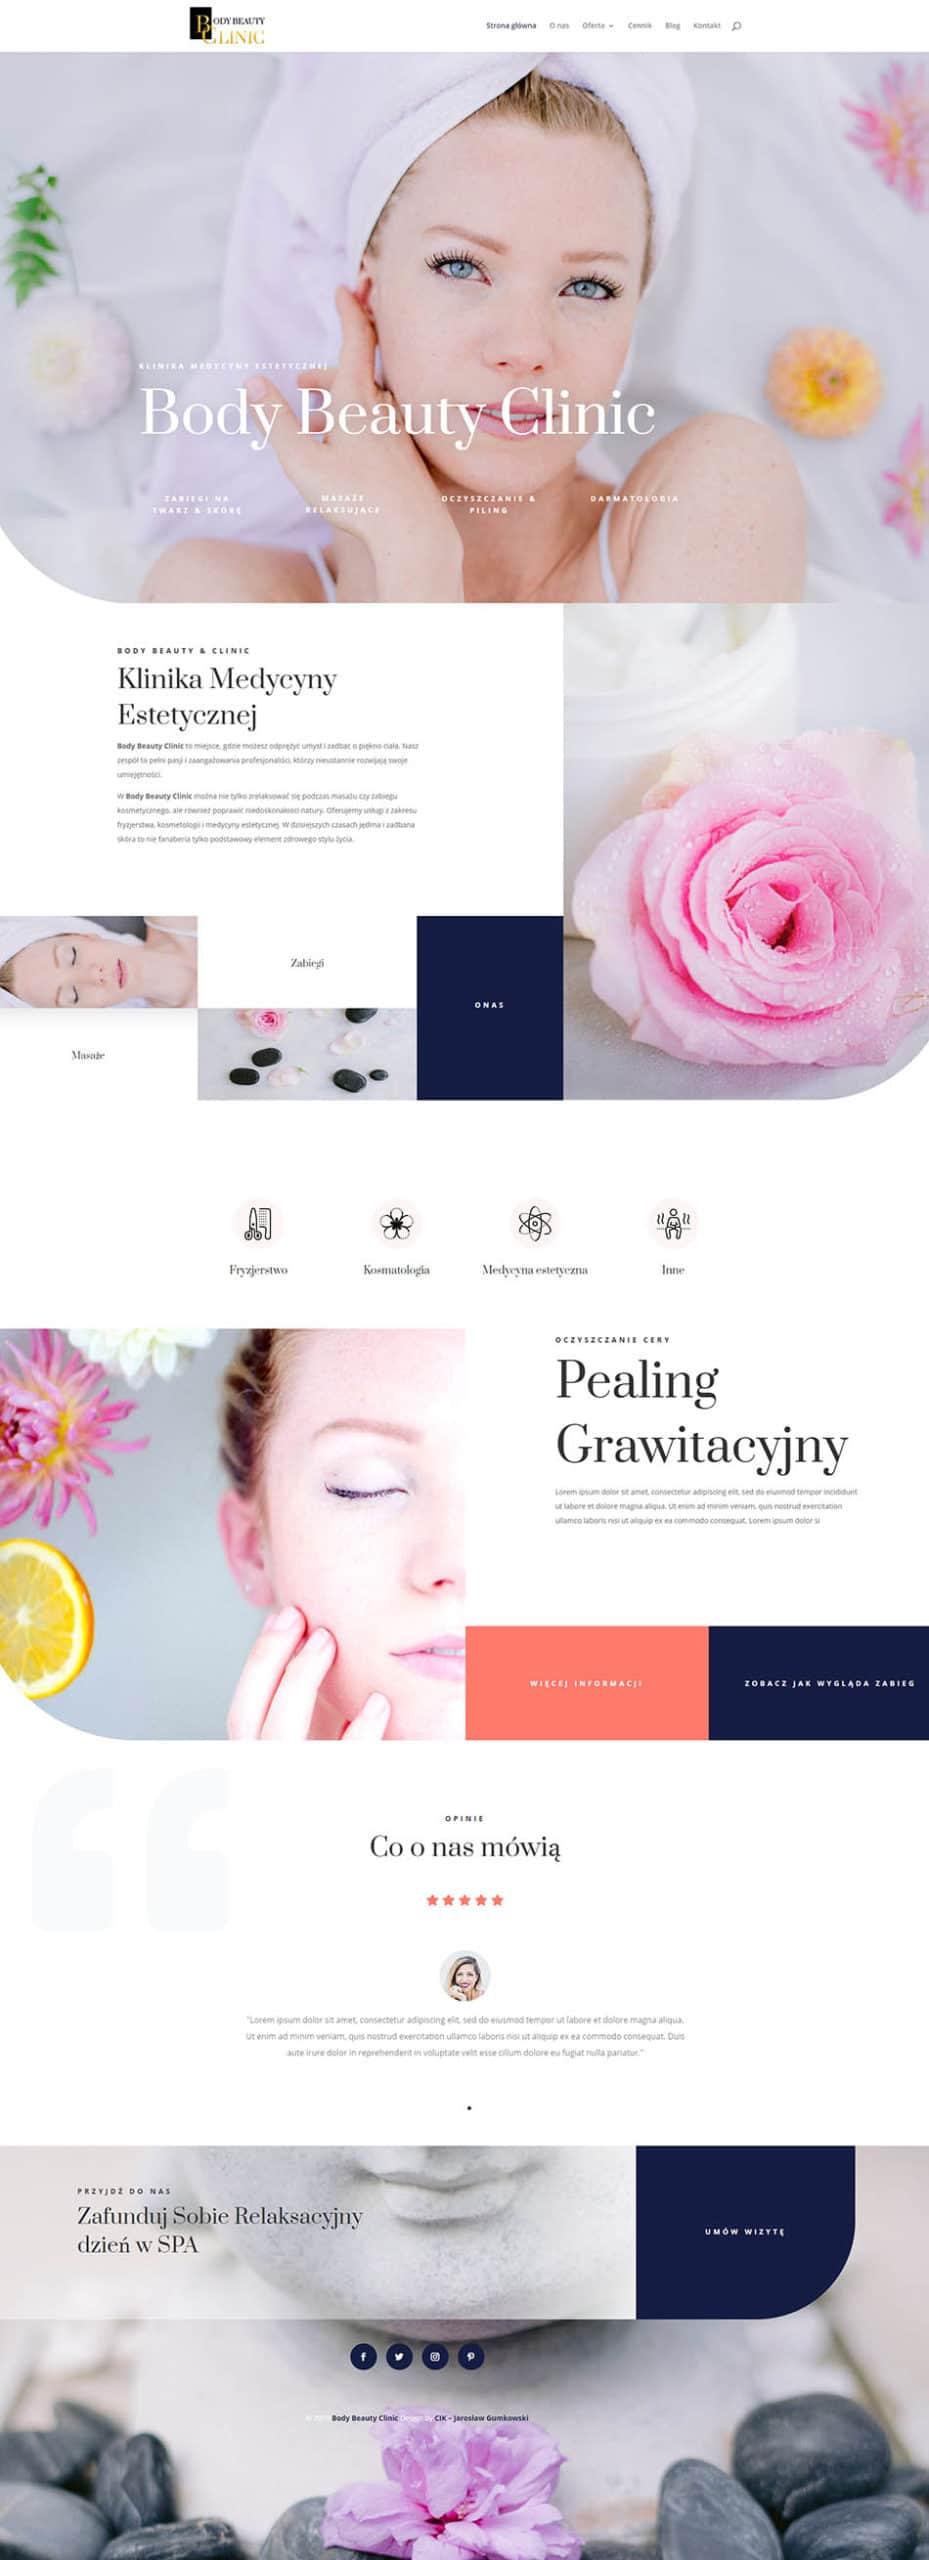 Body Beauty Clinic